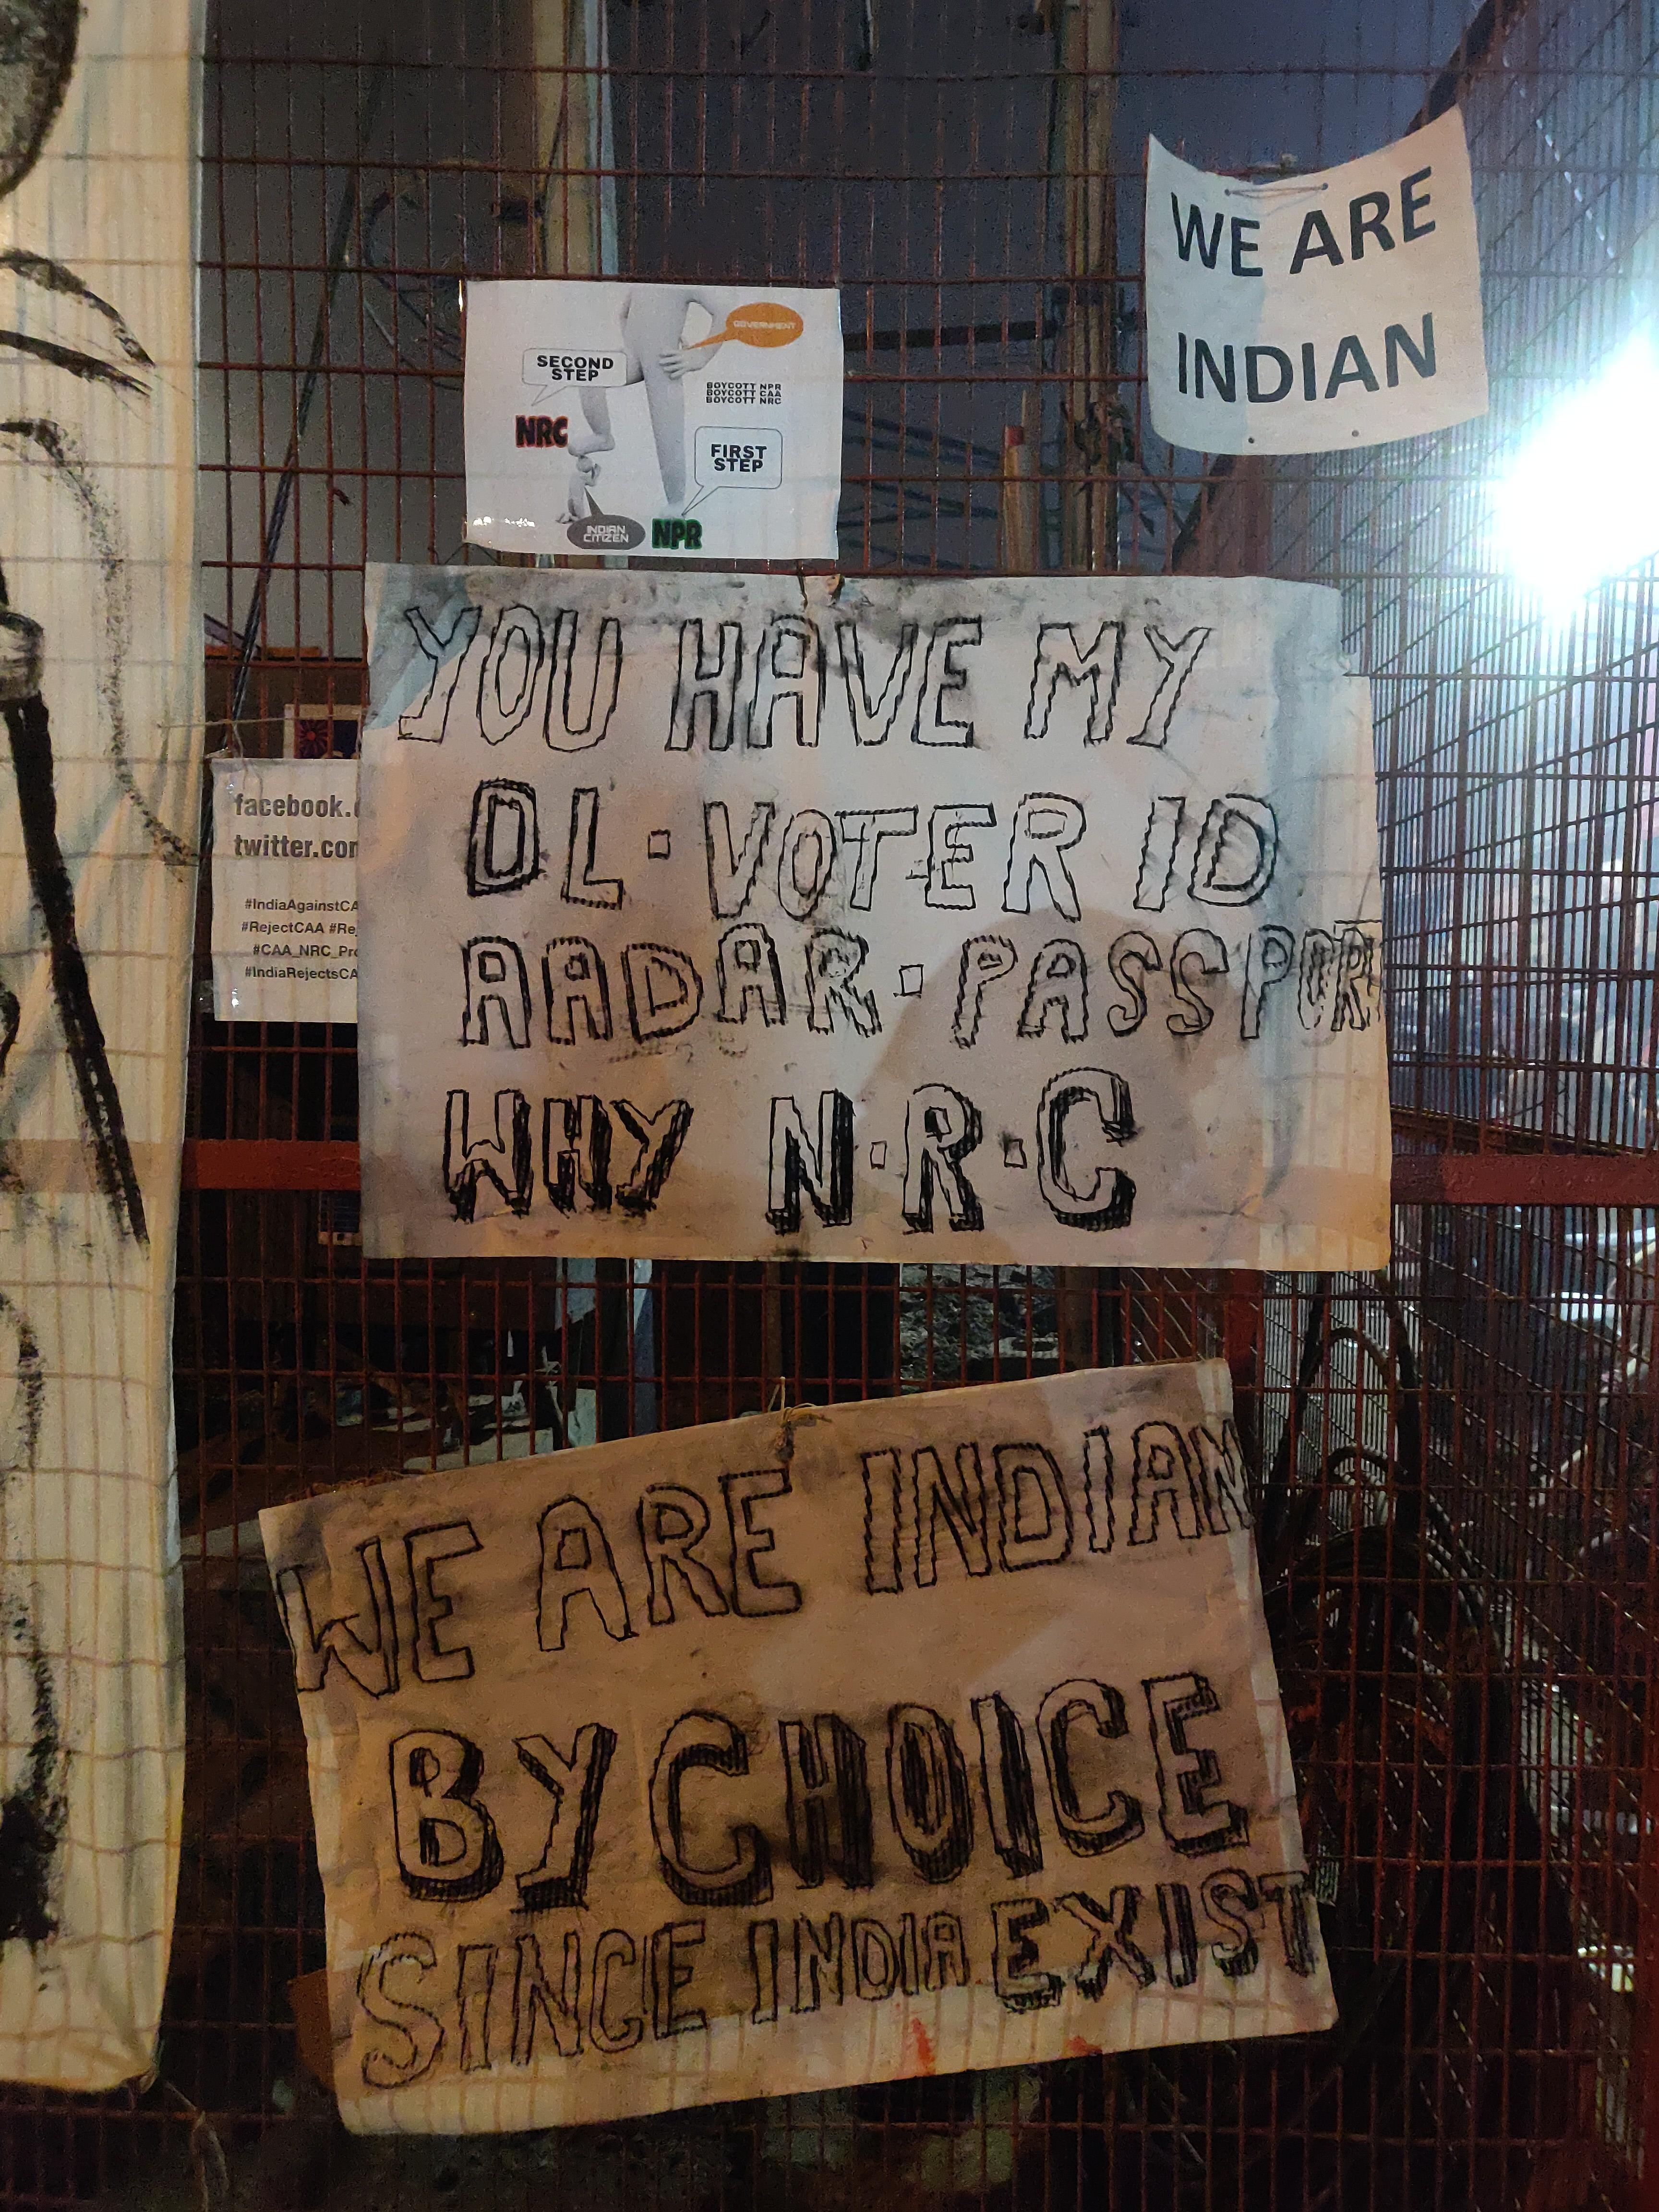 Anti-CAA sit-in in Shaheen Bagh, Delhi, India, 2020 | J-T.M.